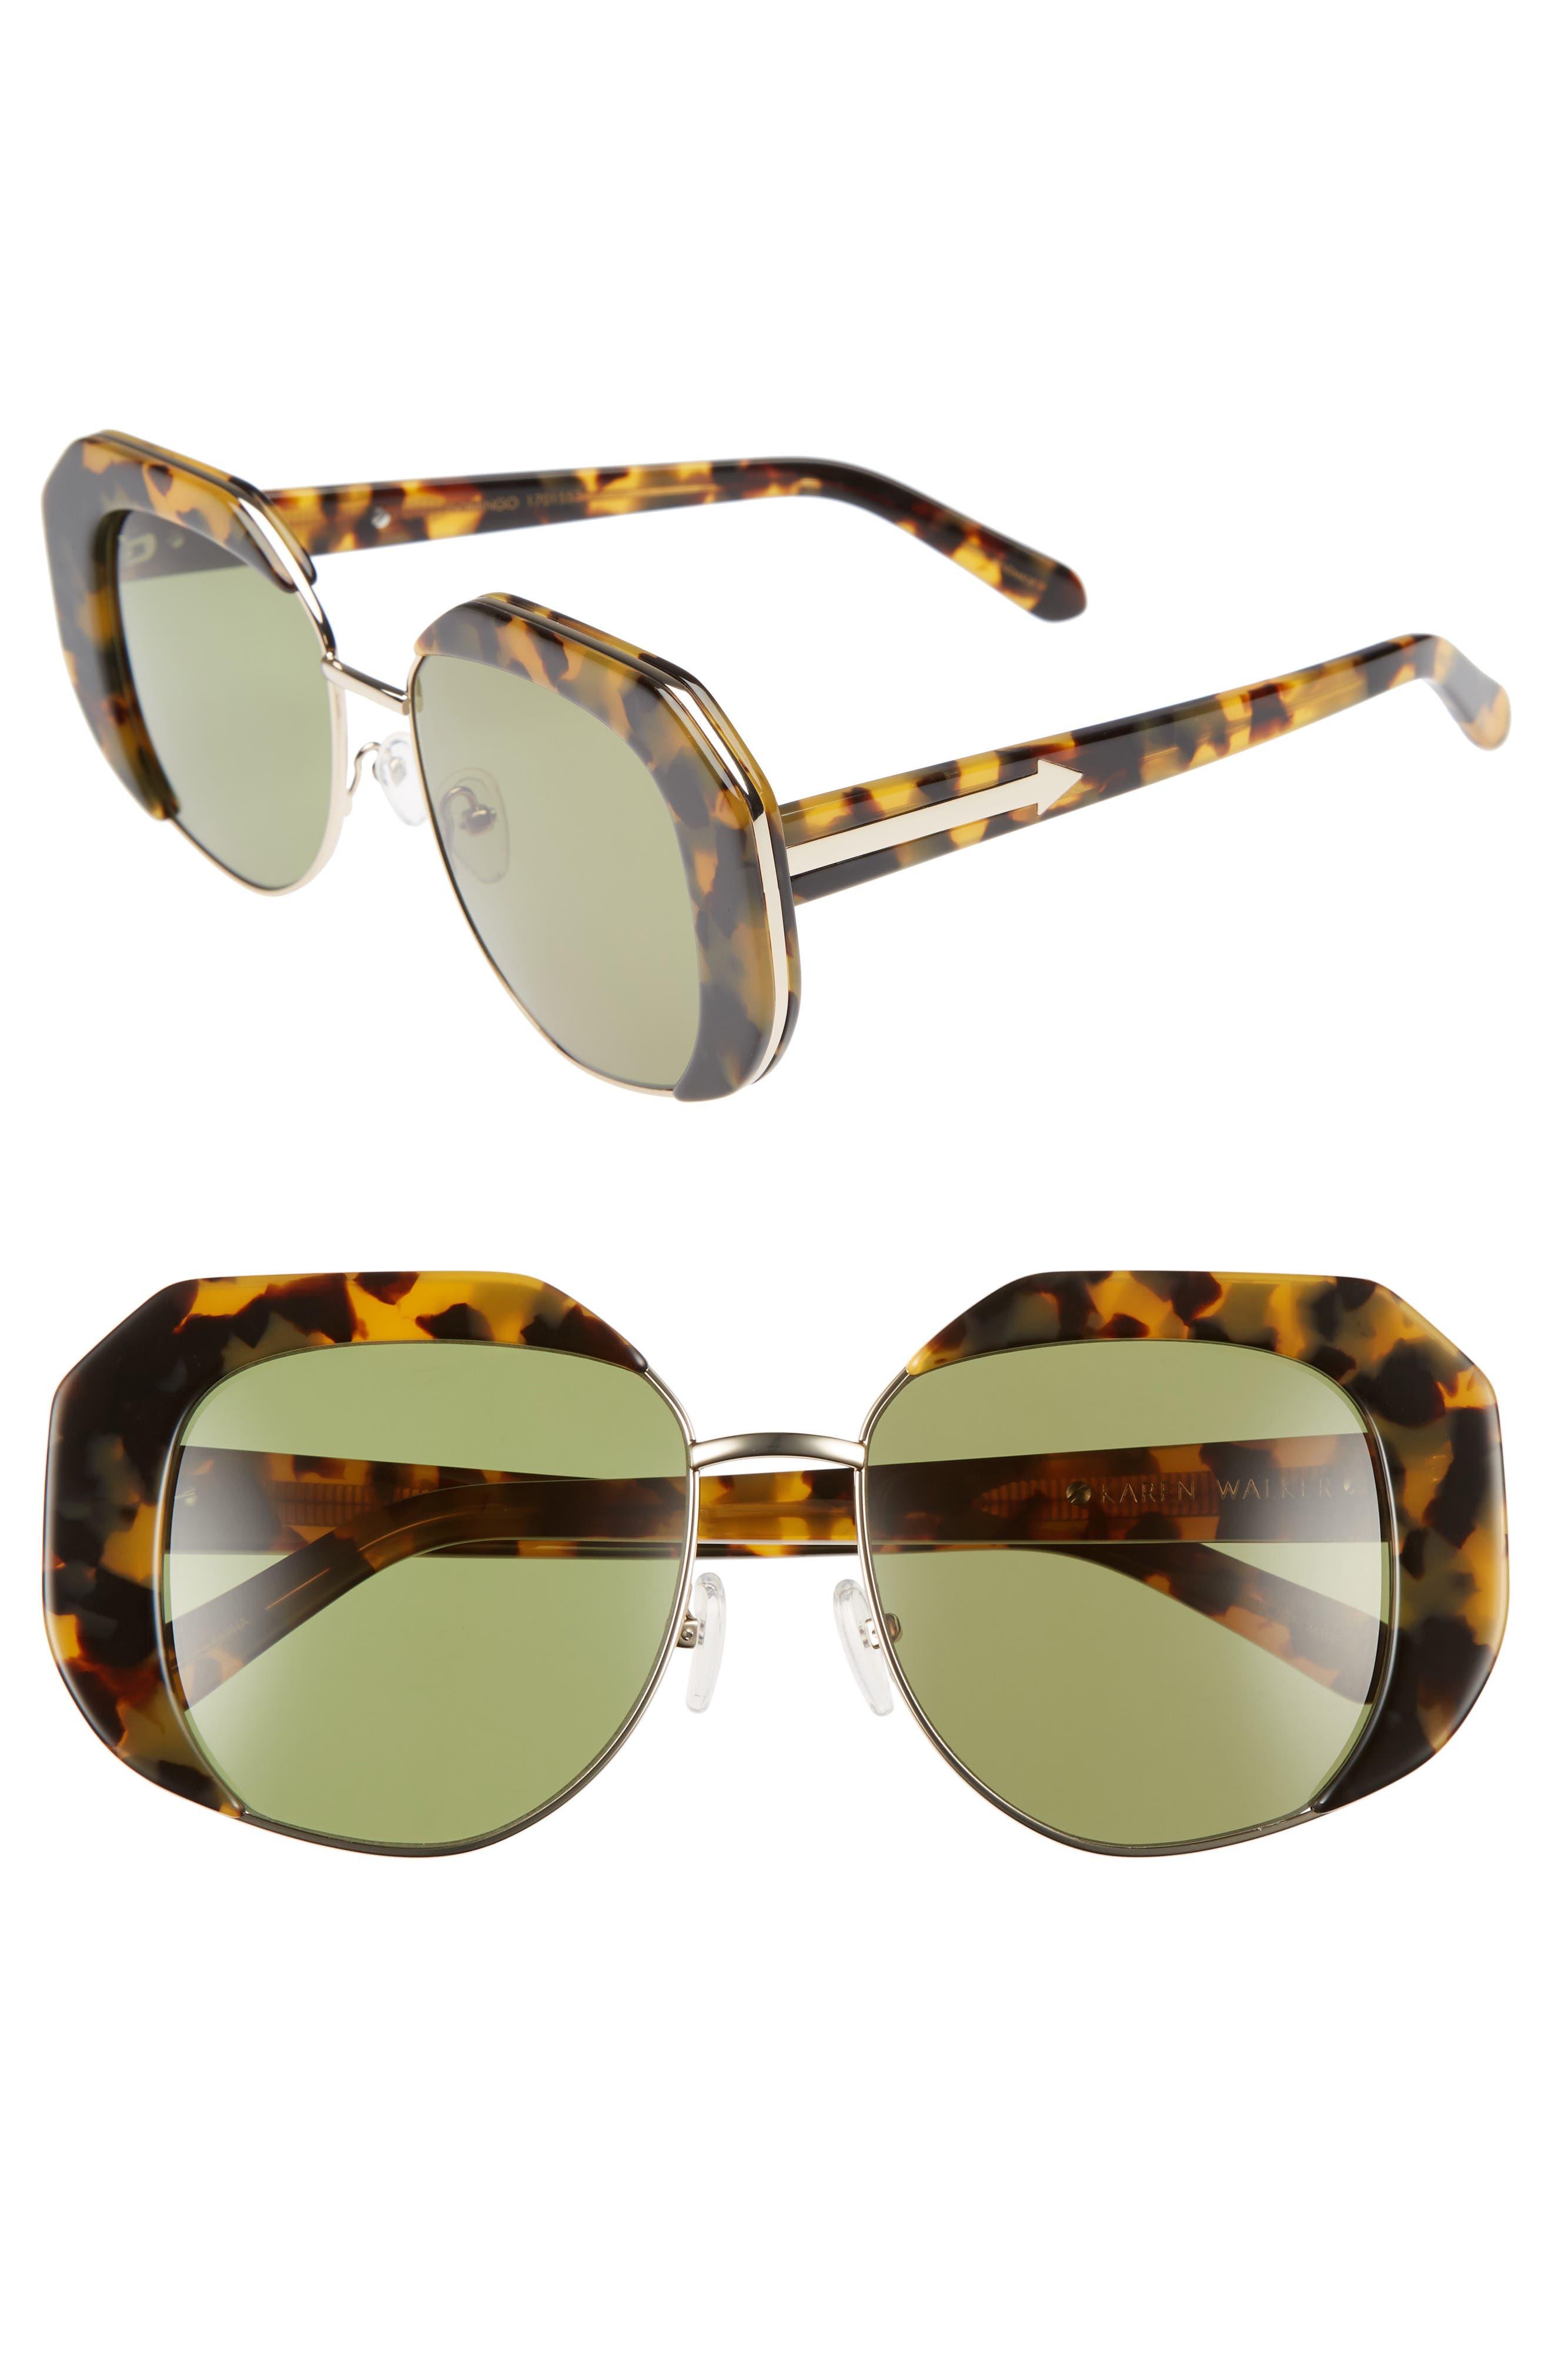 Domingo 52mm Sunglasses,                             Main thumbnail 1, color,                             200